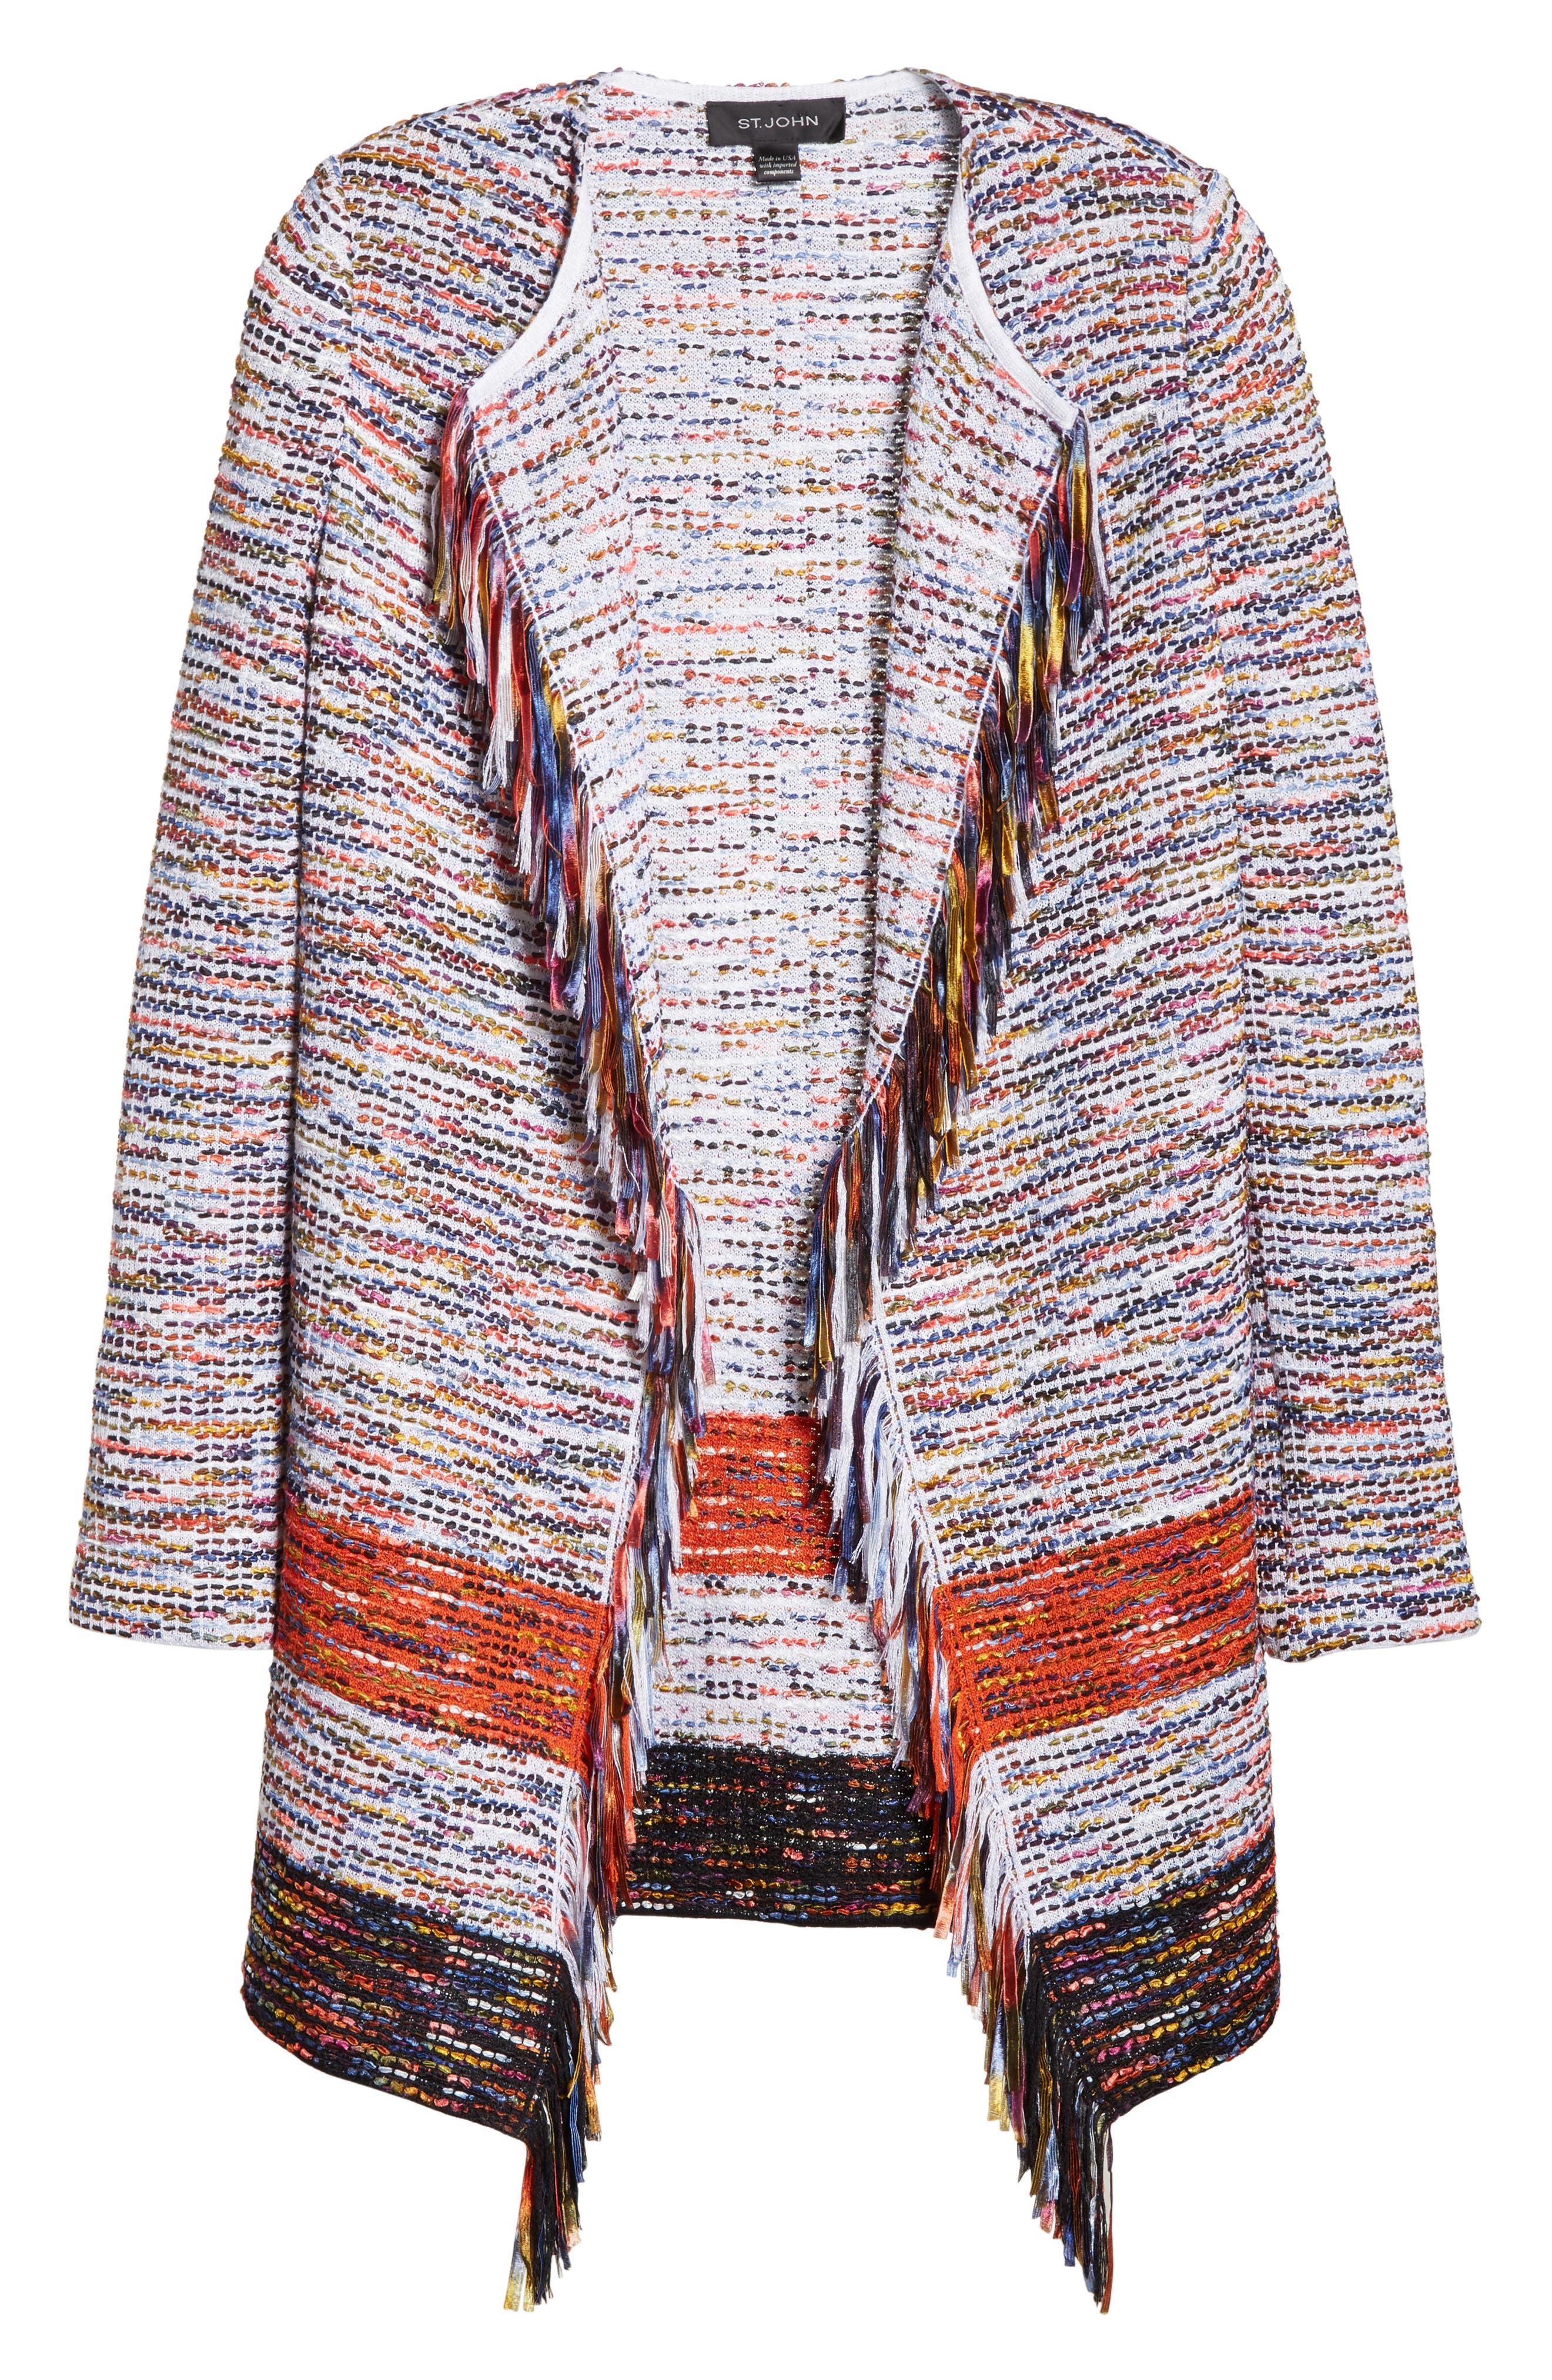 Vertical Fringe Multi Tweed Knit Waterfall Cardigan,                             Alternate thumbnail 6, color,                             SIENNA MULTI